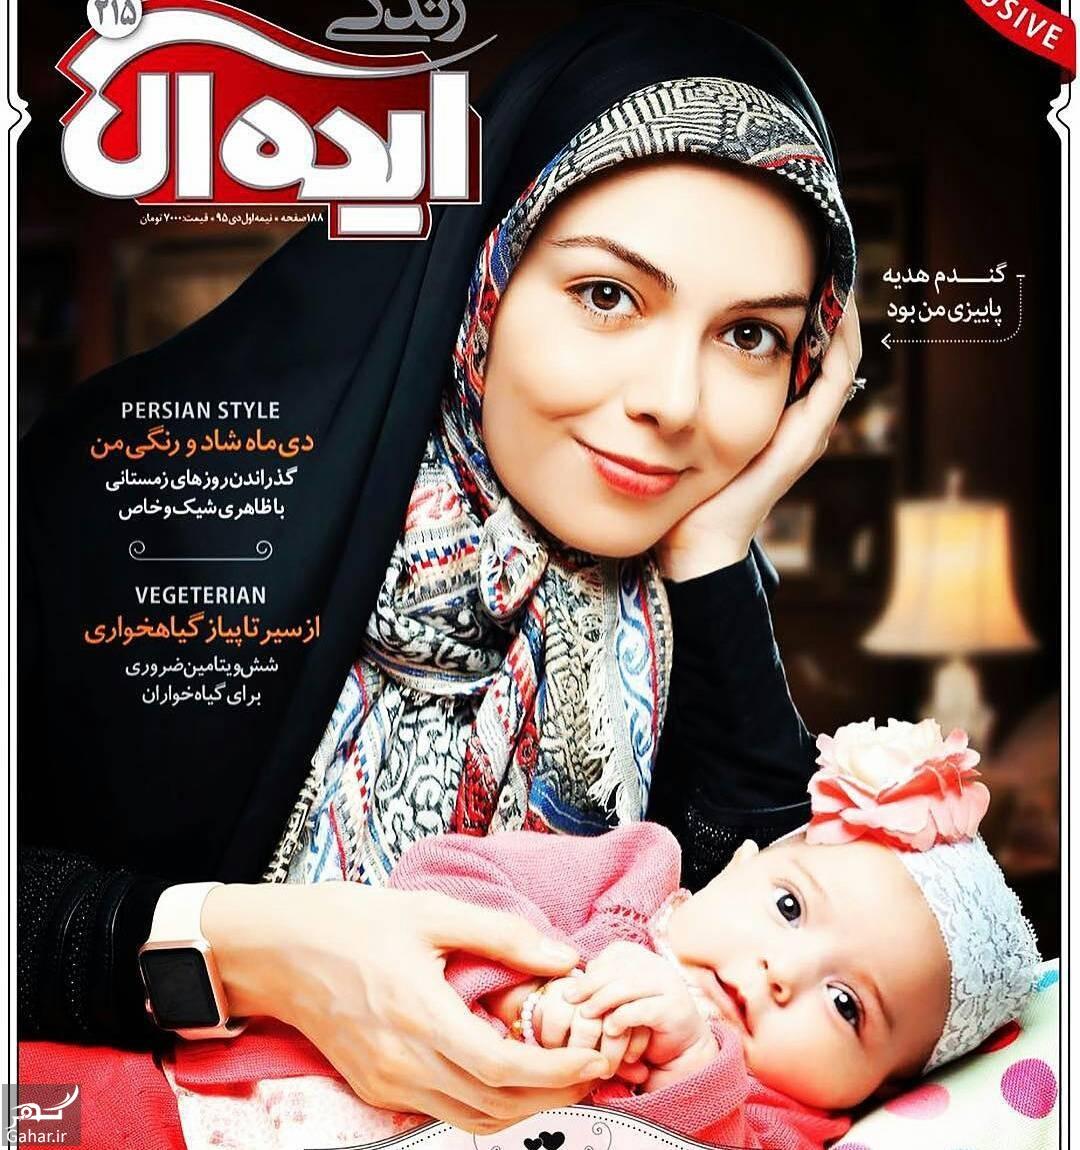 BORGGitjnZ5 جدیدترین عکس آزاده نامداری و دخترش  گندم روی جلد مجله